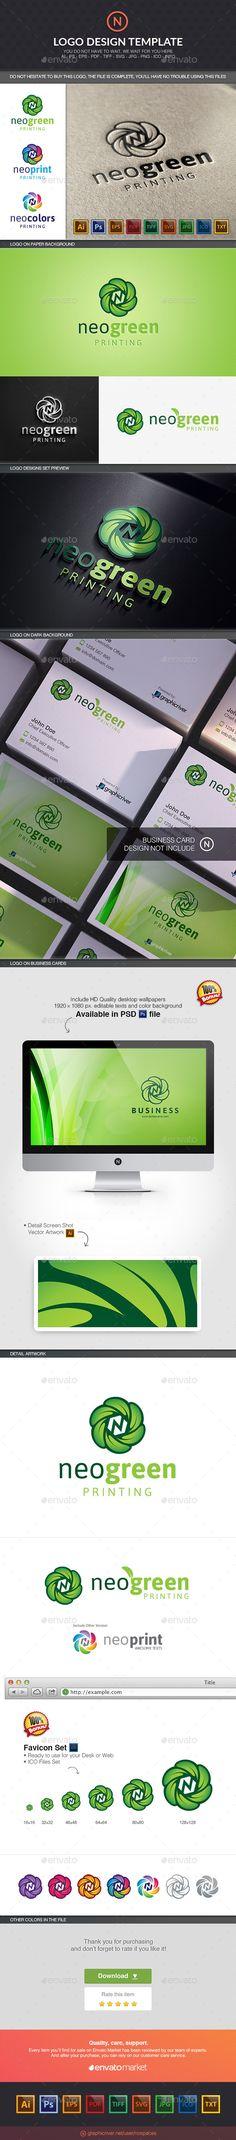 Nanogreen - Logo Design Template Vector #logotype Download it here: http://graphicriver.net/item/nanogreen/10597206?s_rank=1195?ref=nesto